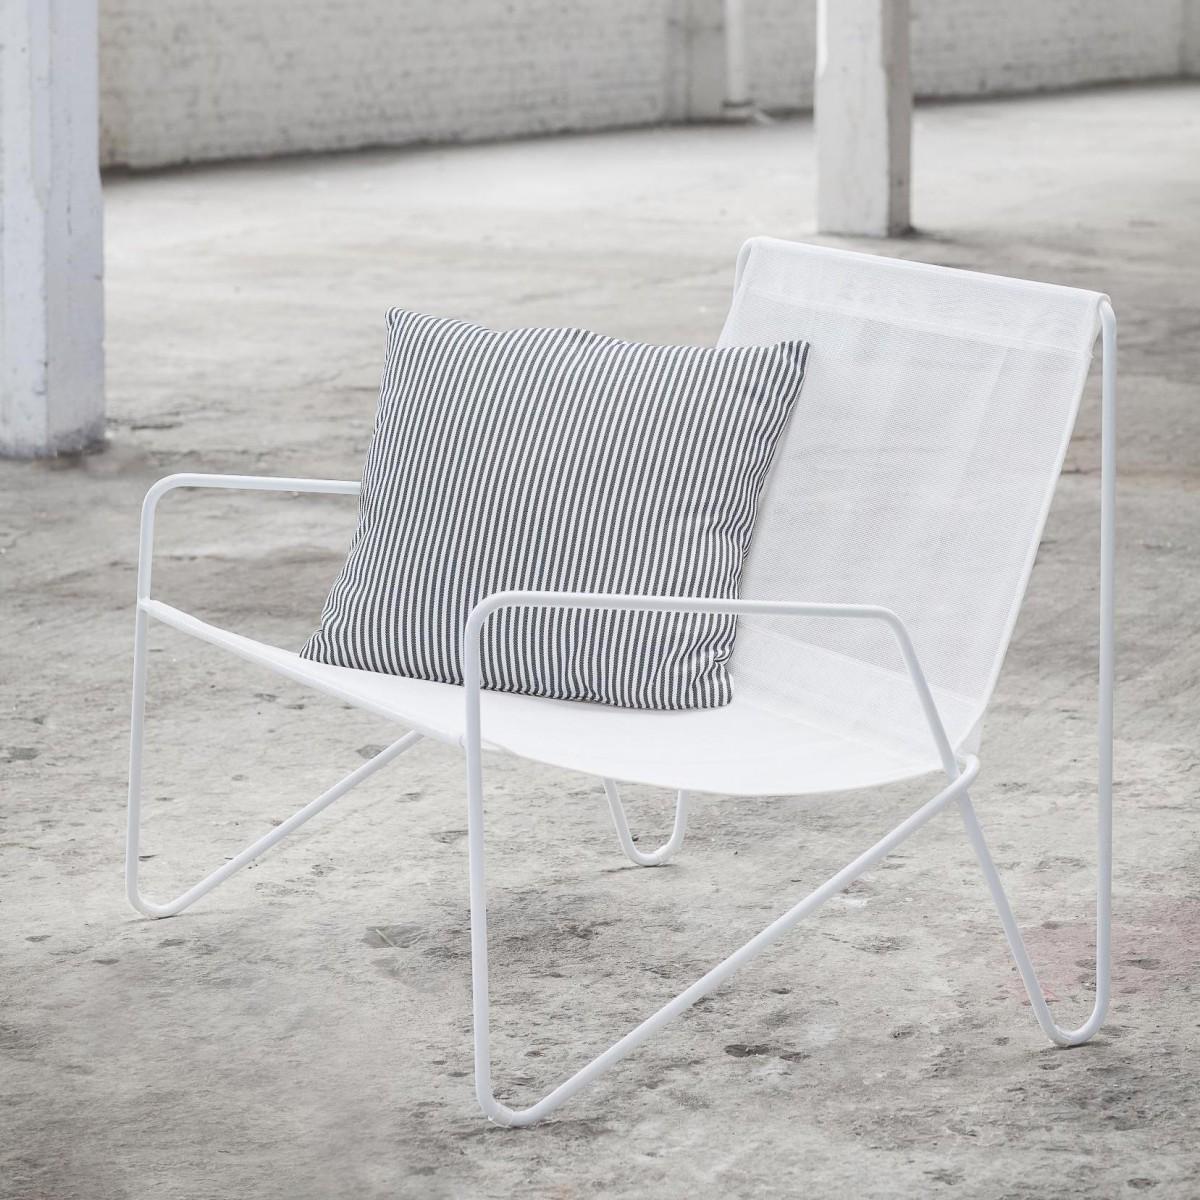 fauteuil-paola-navone-toile-serax.jpg